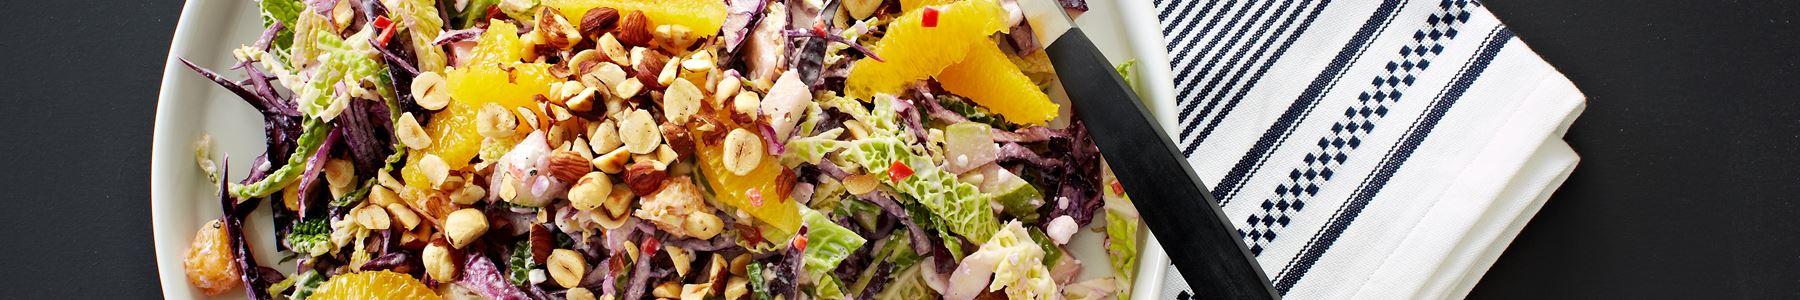 Salater + Chili + Piskefløde